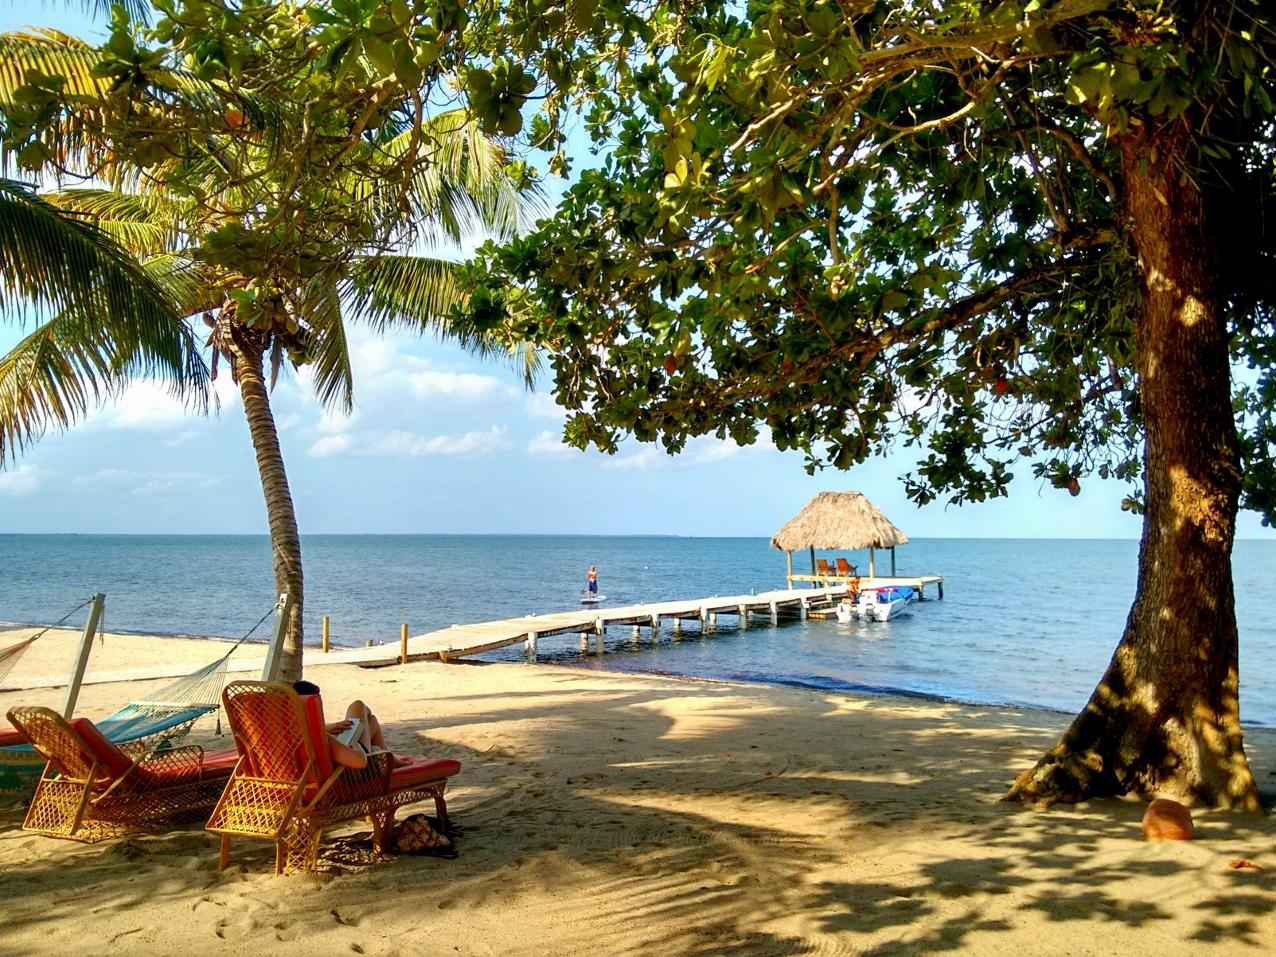 Almond Beach, Hopkins Beach, Belize